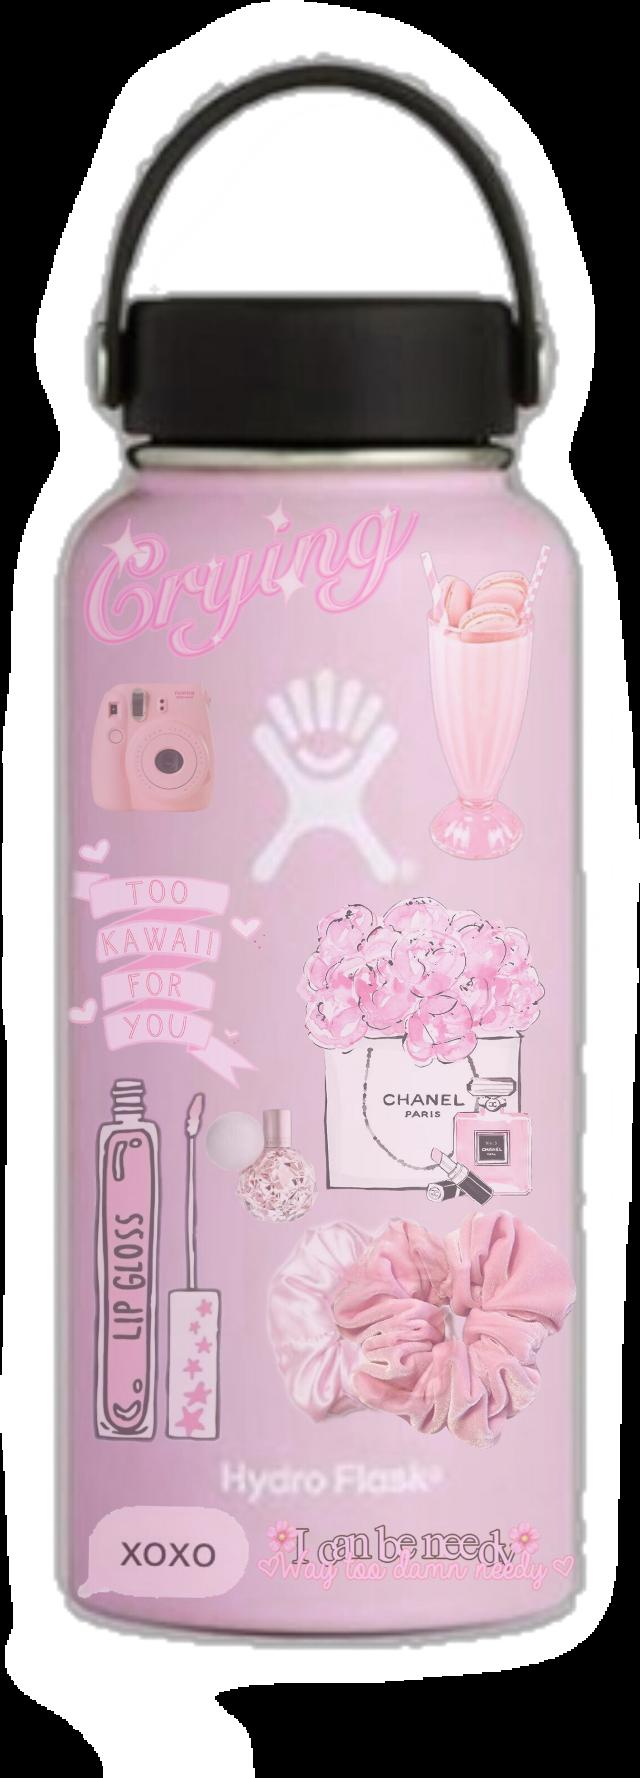 #pink #pinkaesthetic #aesthetic #basic #basicgirl #hydroflask #pinkhydroflask #waterbottle #trendy #niche #nichememes #pastelpink #ariana #polyvore #polyvorepng #pngs #pngaesthetic